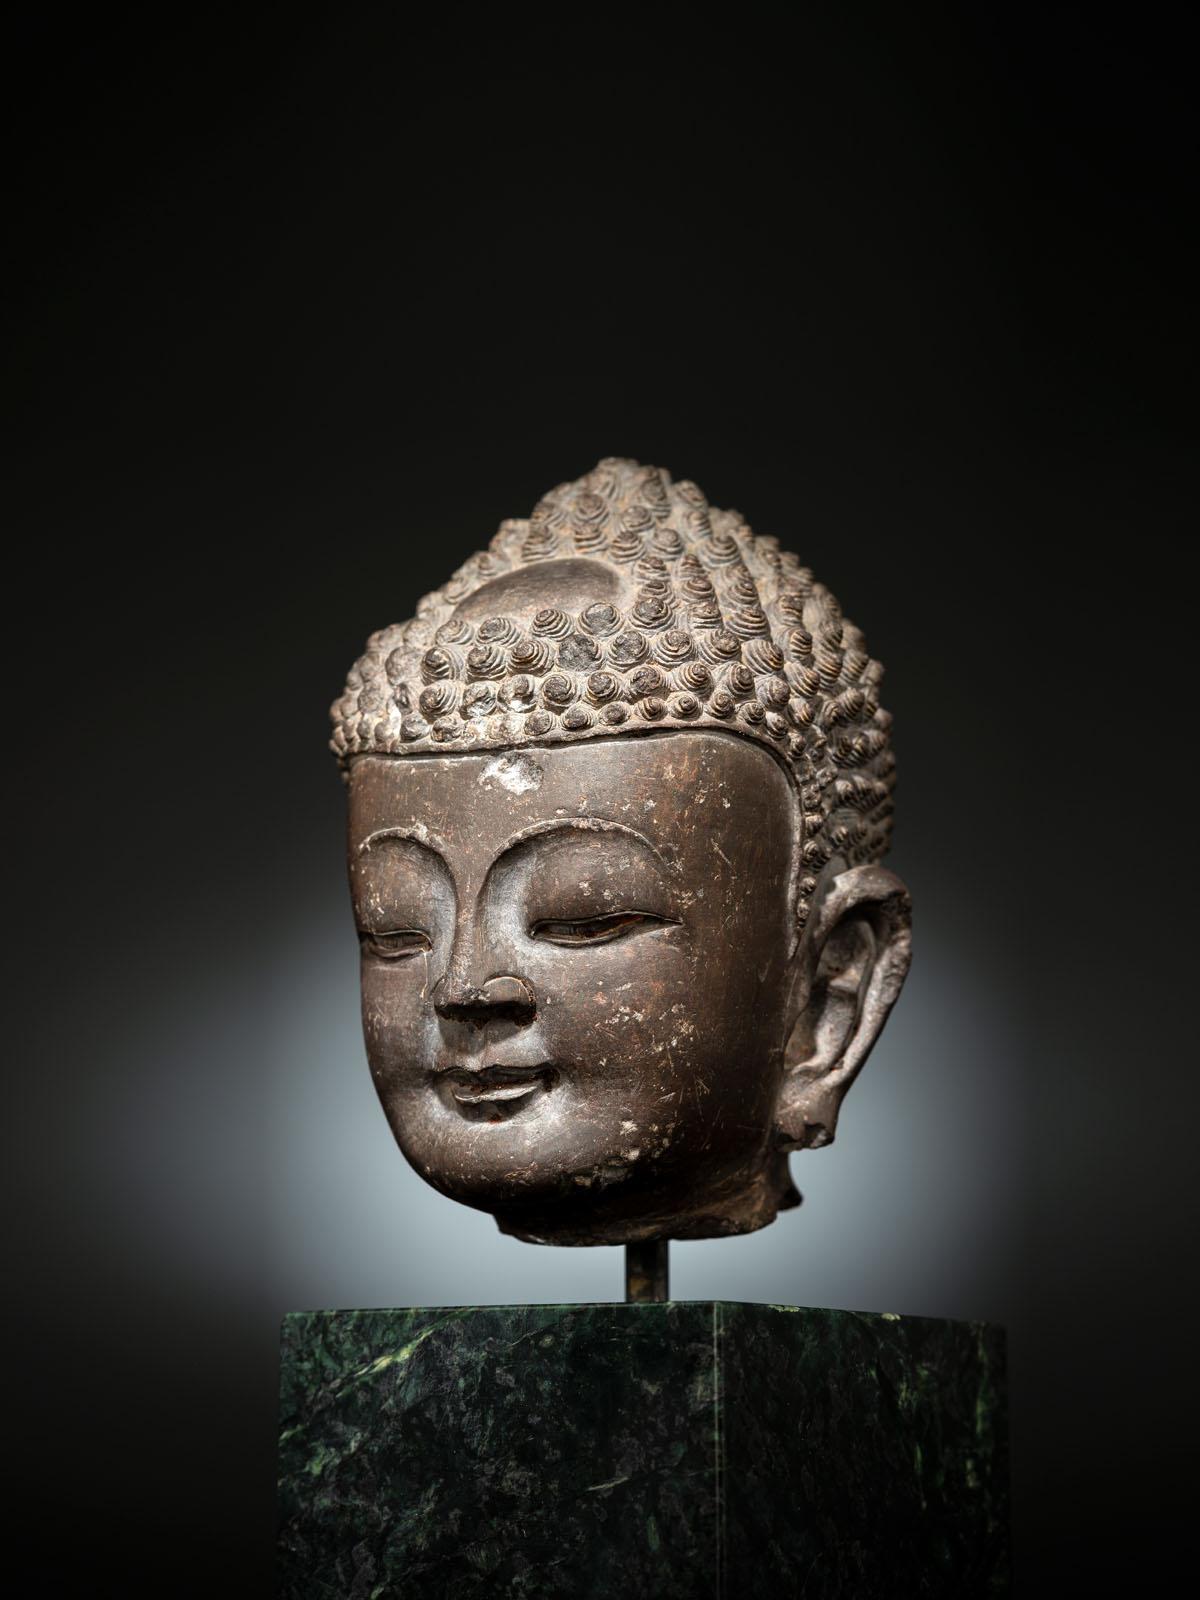 A FINE CARVED GREY-BROWN CARVED STONE HEAD OF BUDDHA SHAKYAMUNI - Image 4 of 10